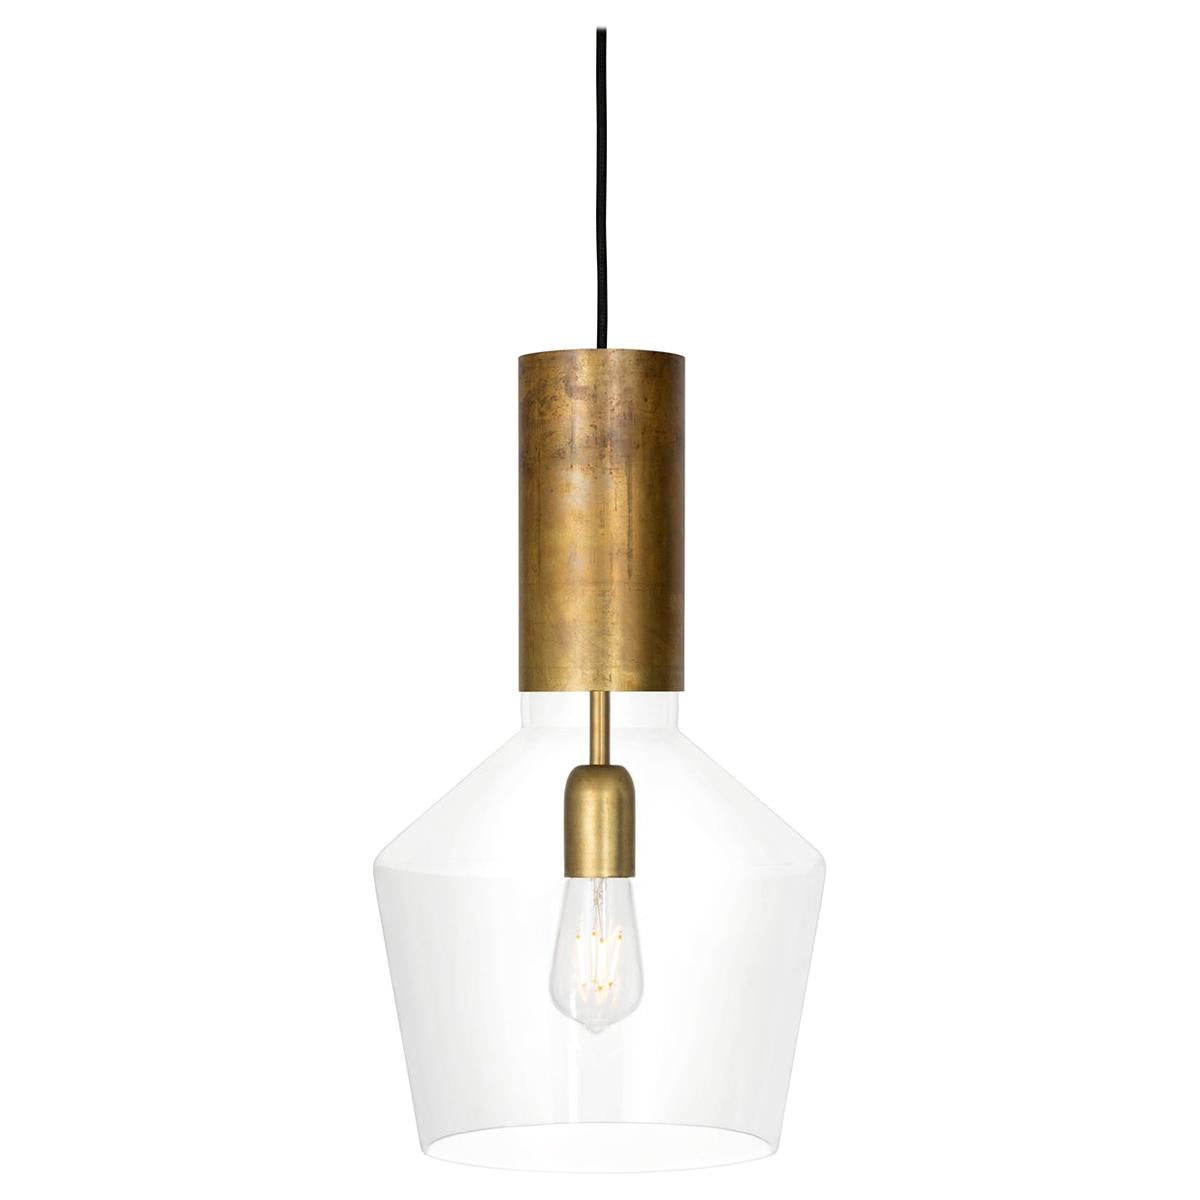 Sabina Grubbeson Fenomen Widh Clear Glass Ceiling Lamp by Konsthantverk